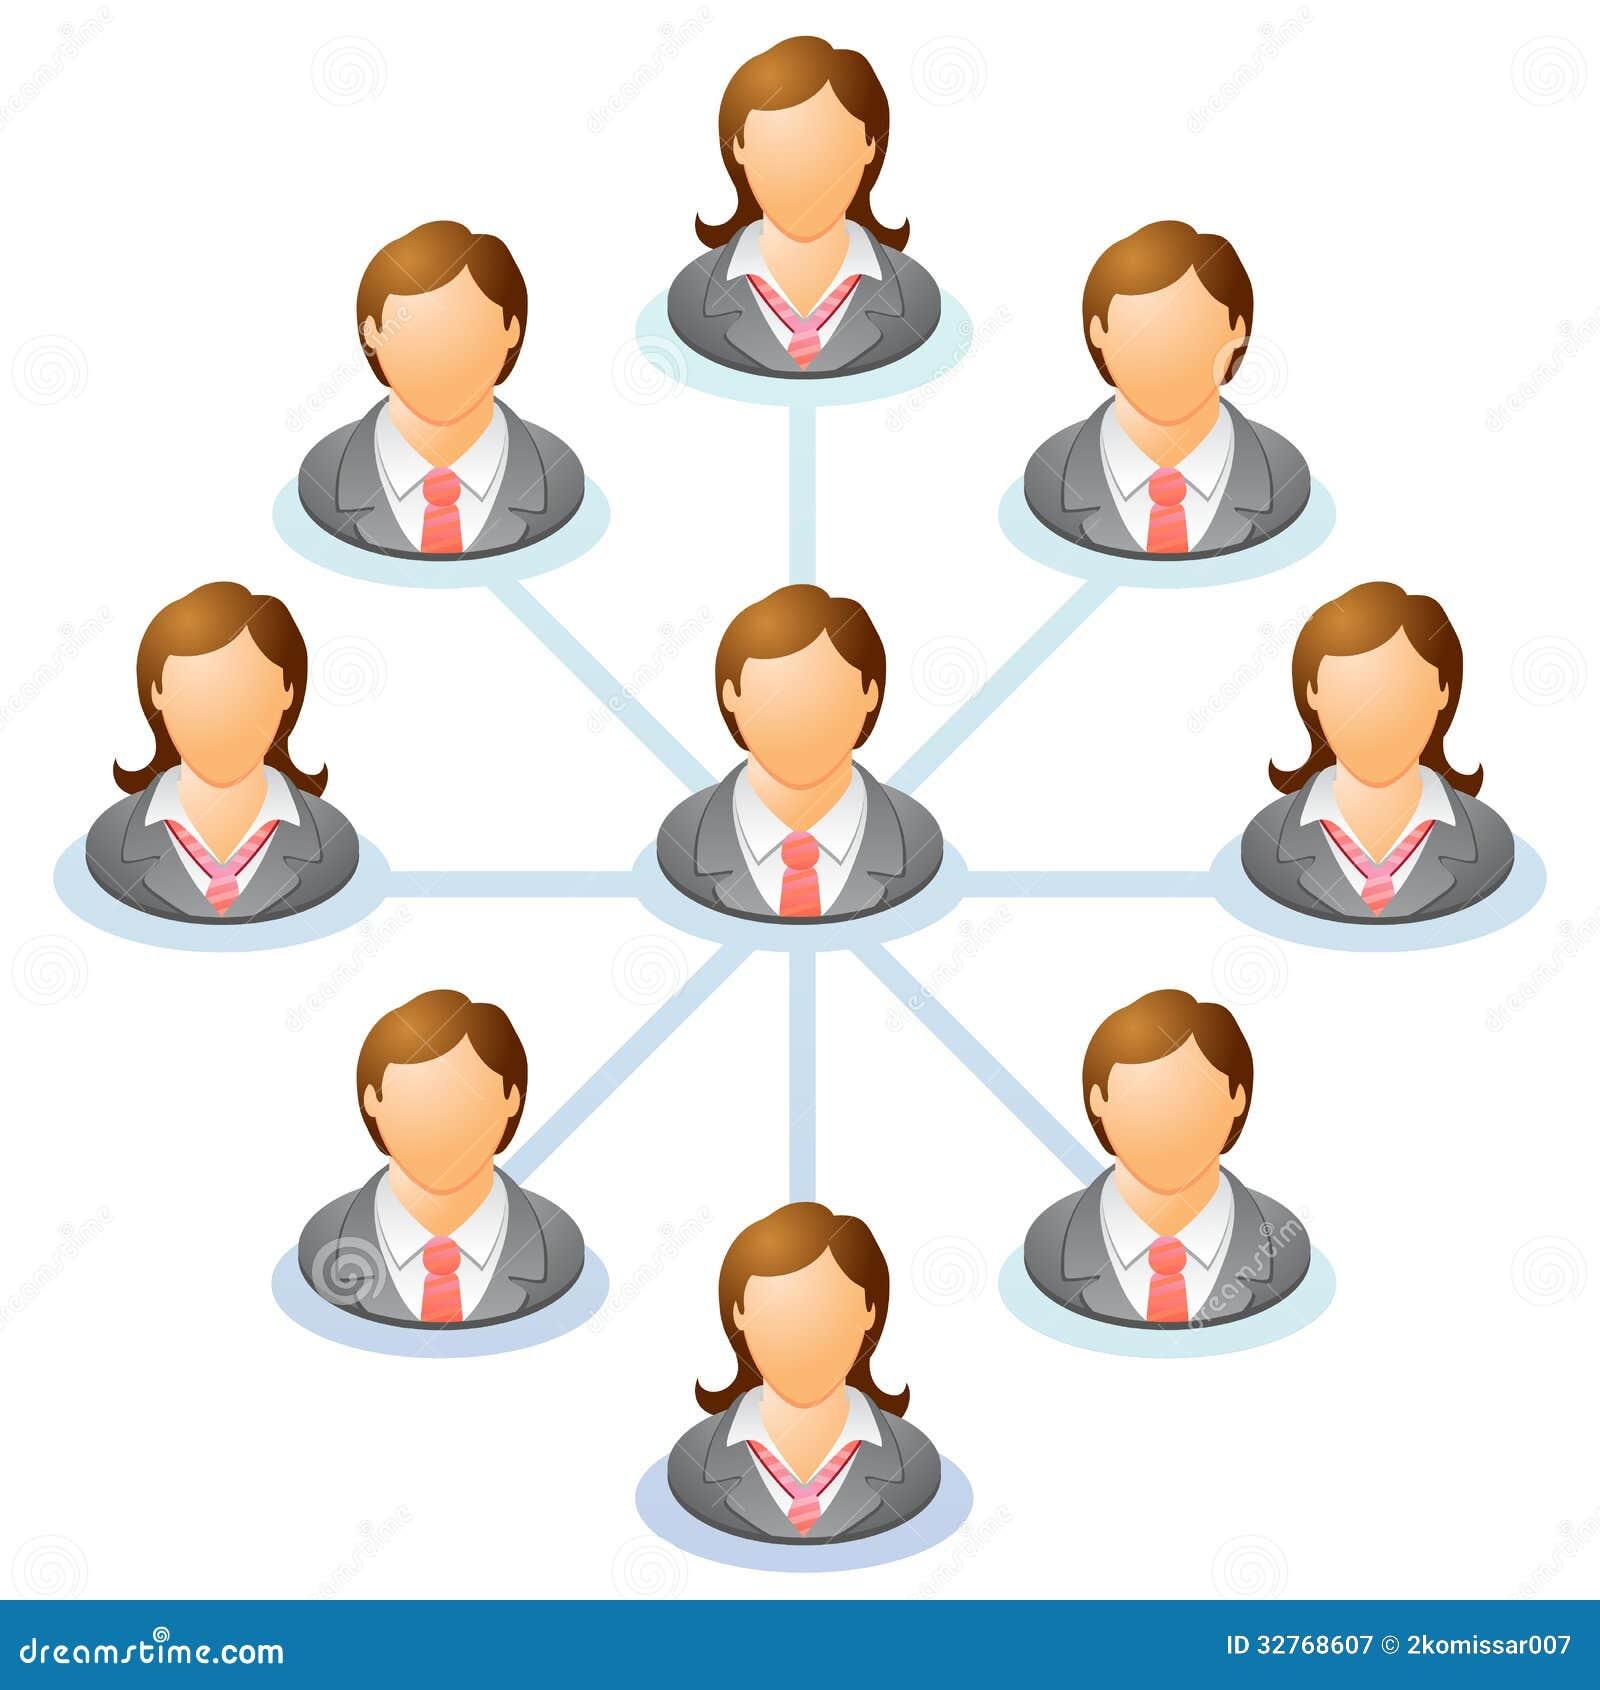 Organization Chart Royalty Free Stock Photography